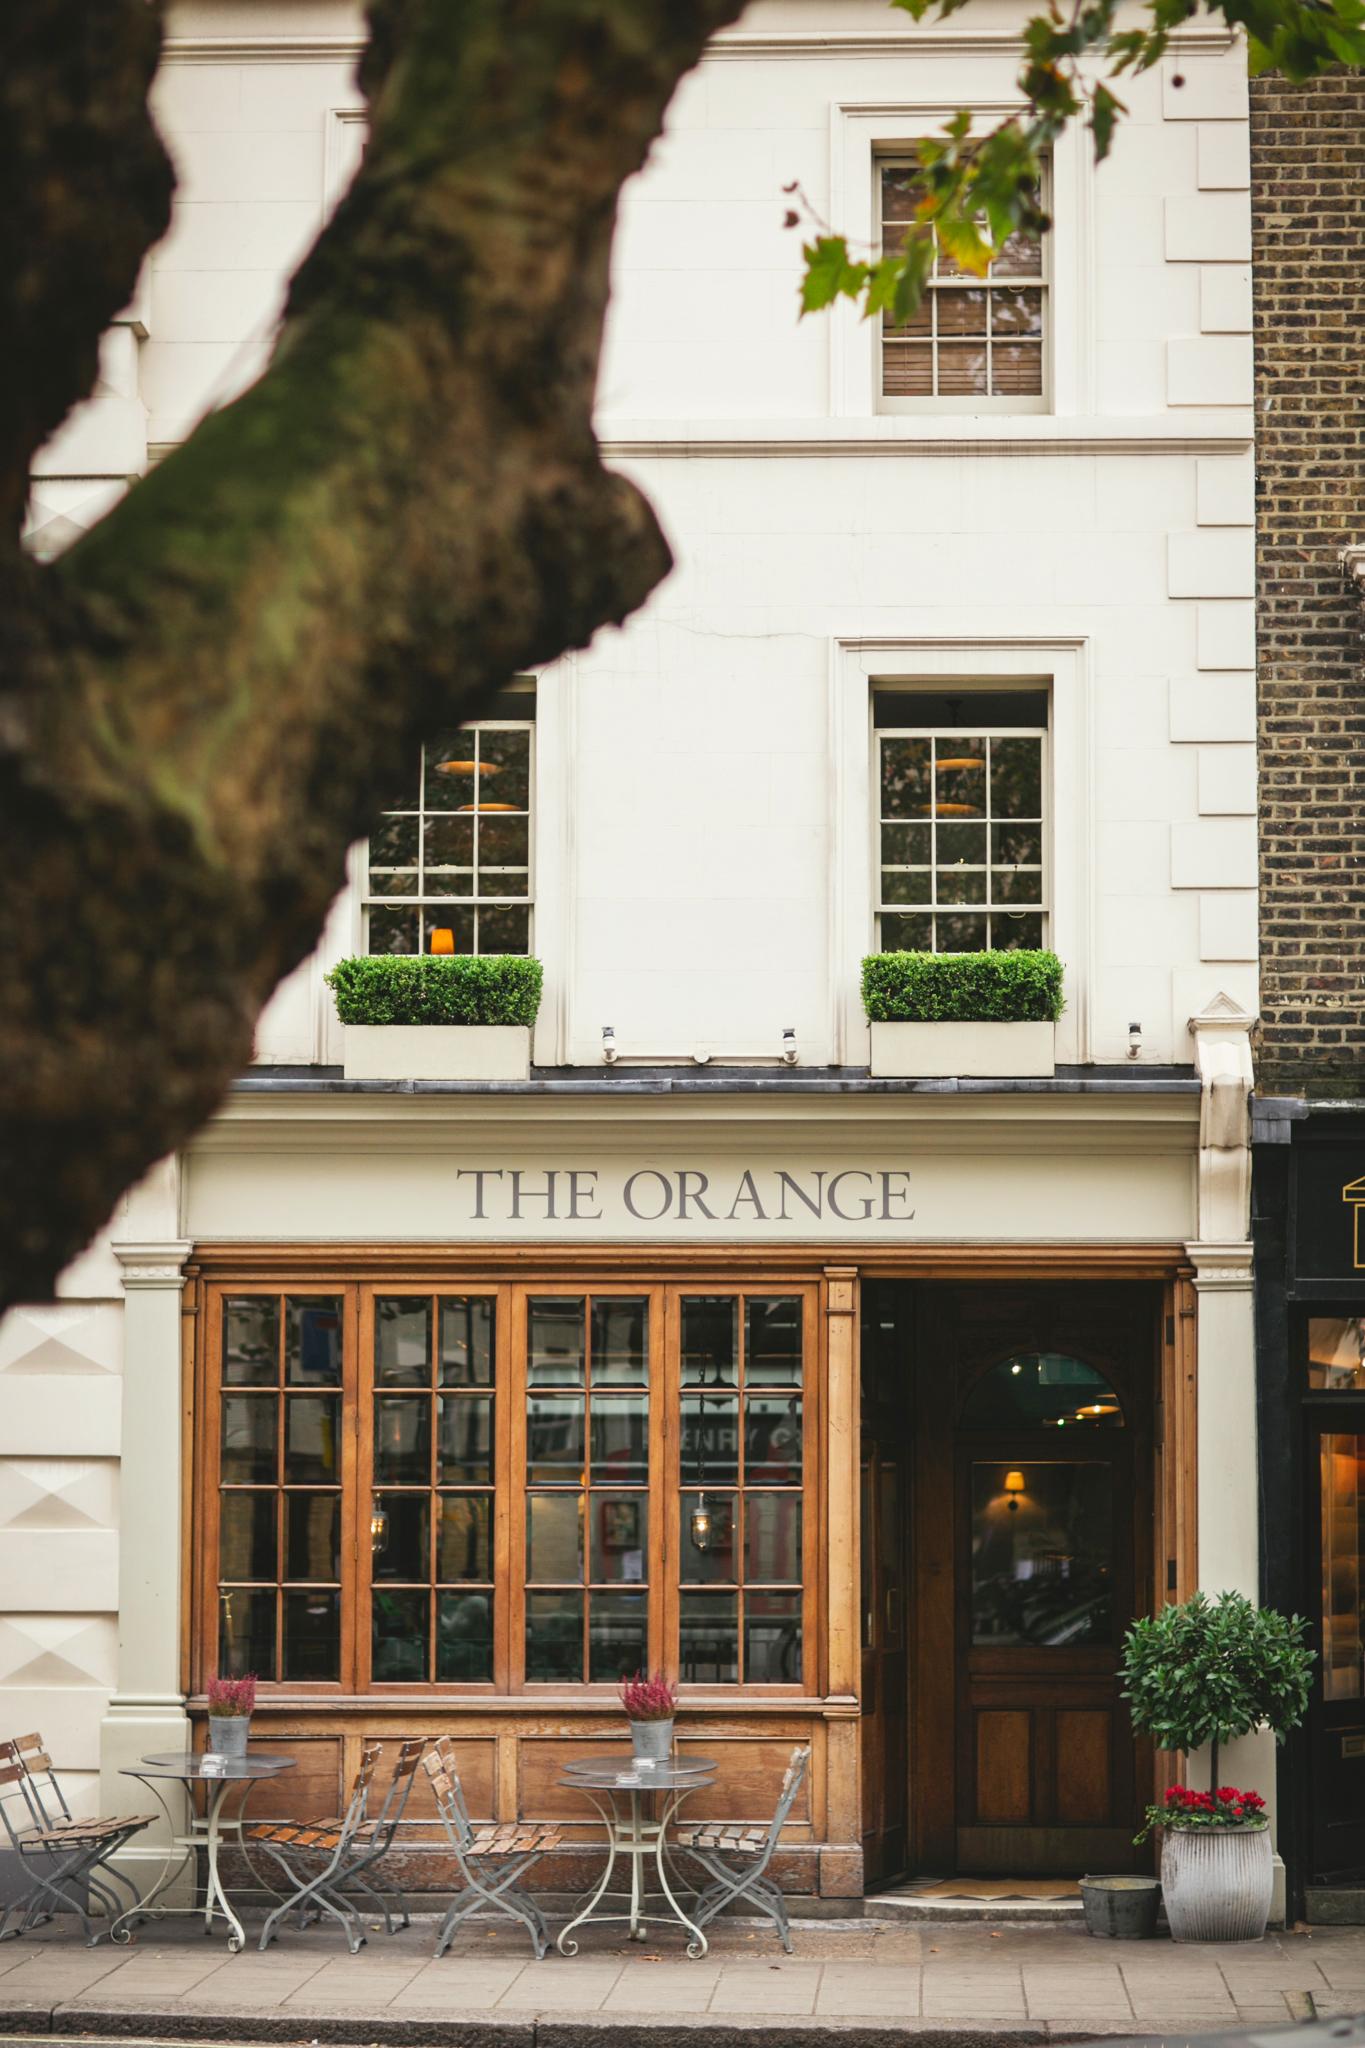 The Orange, Pimlico Road